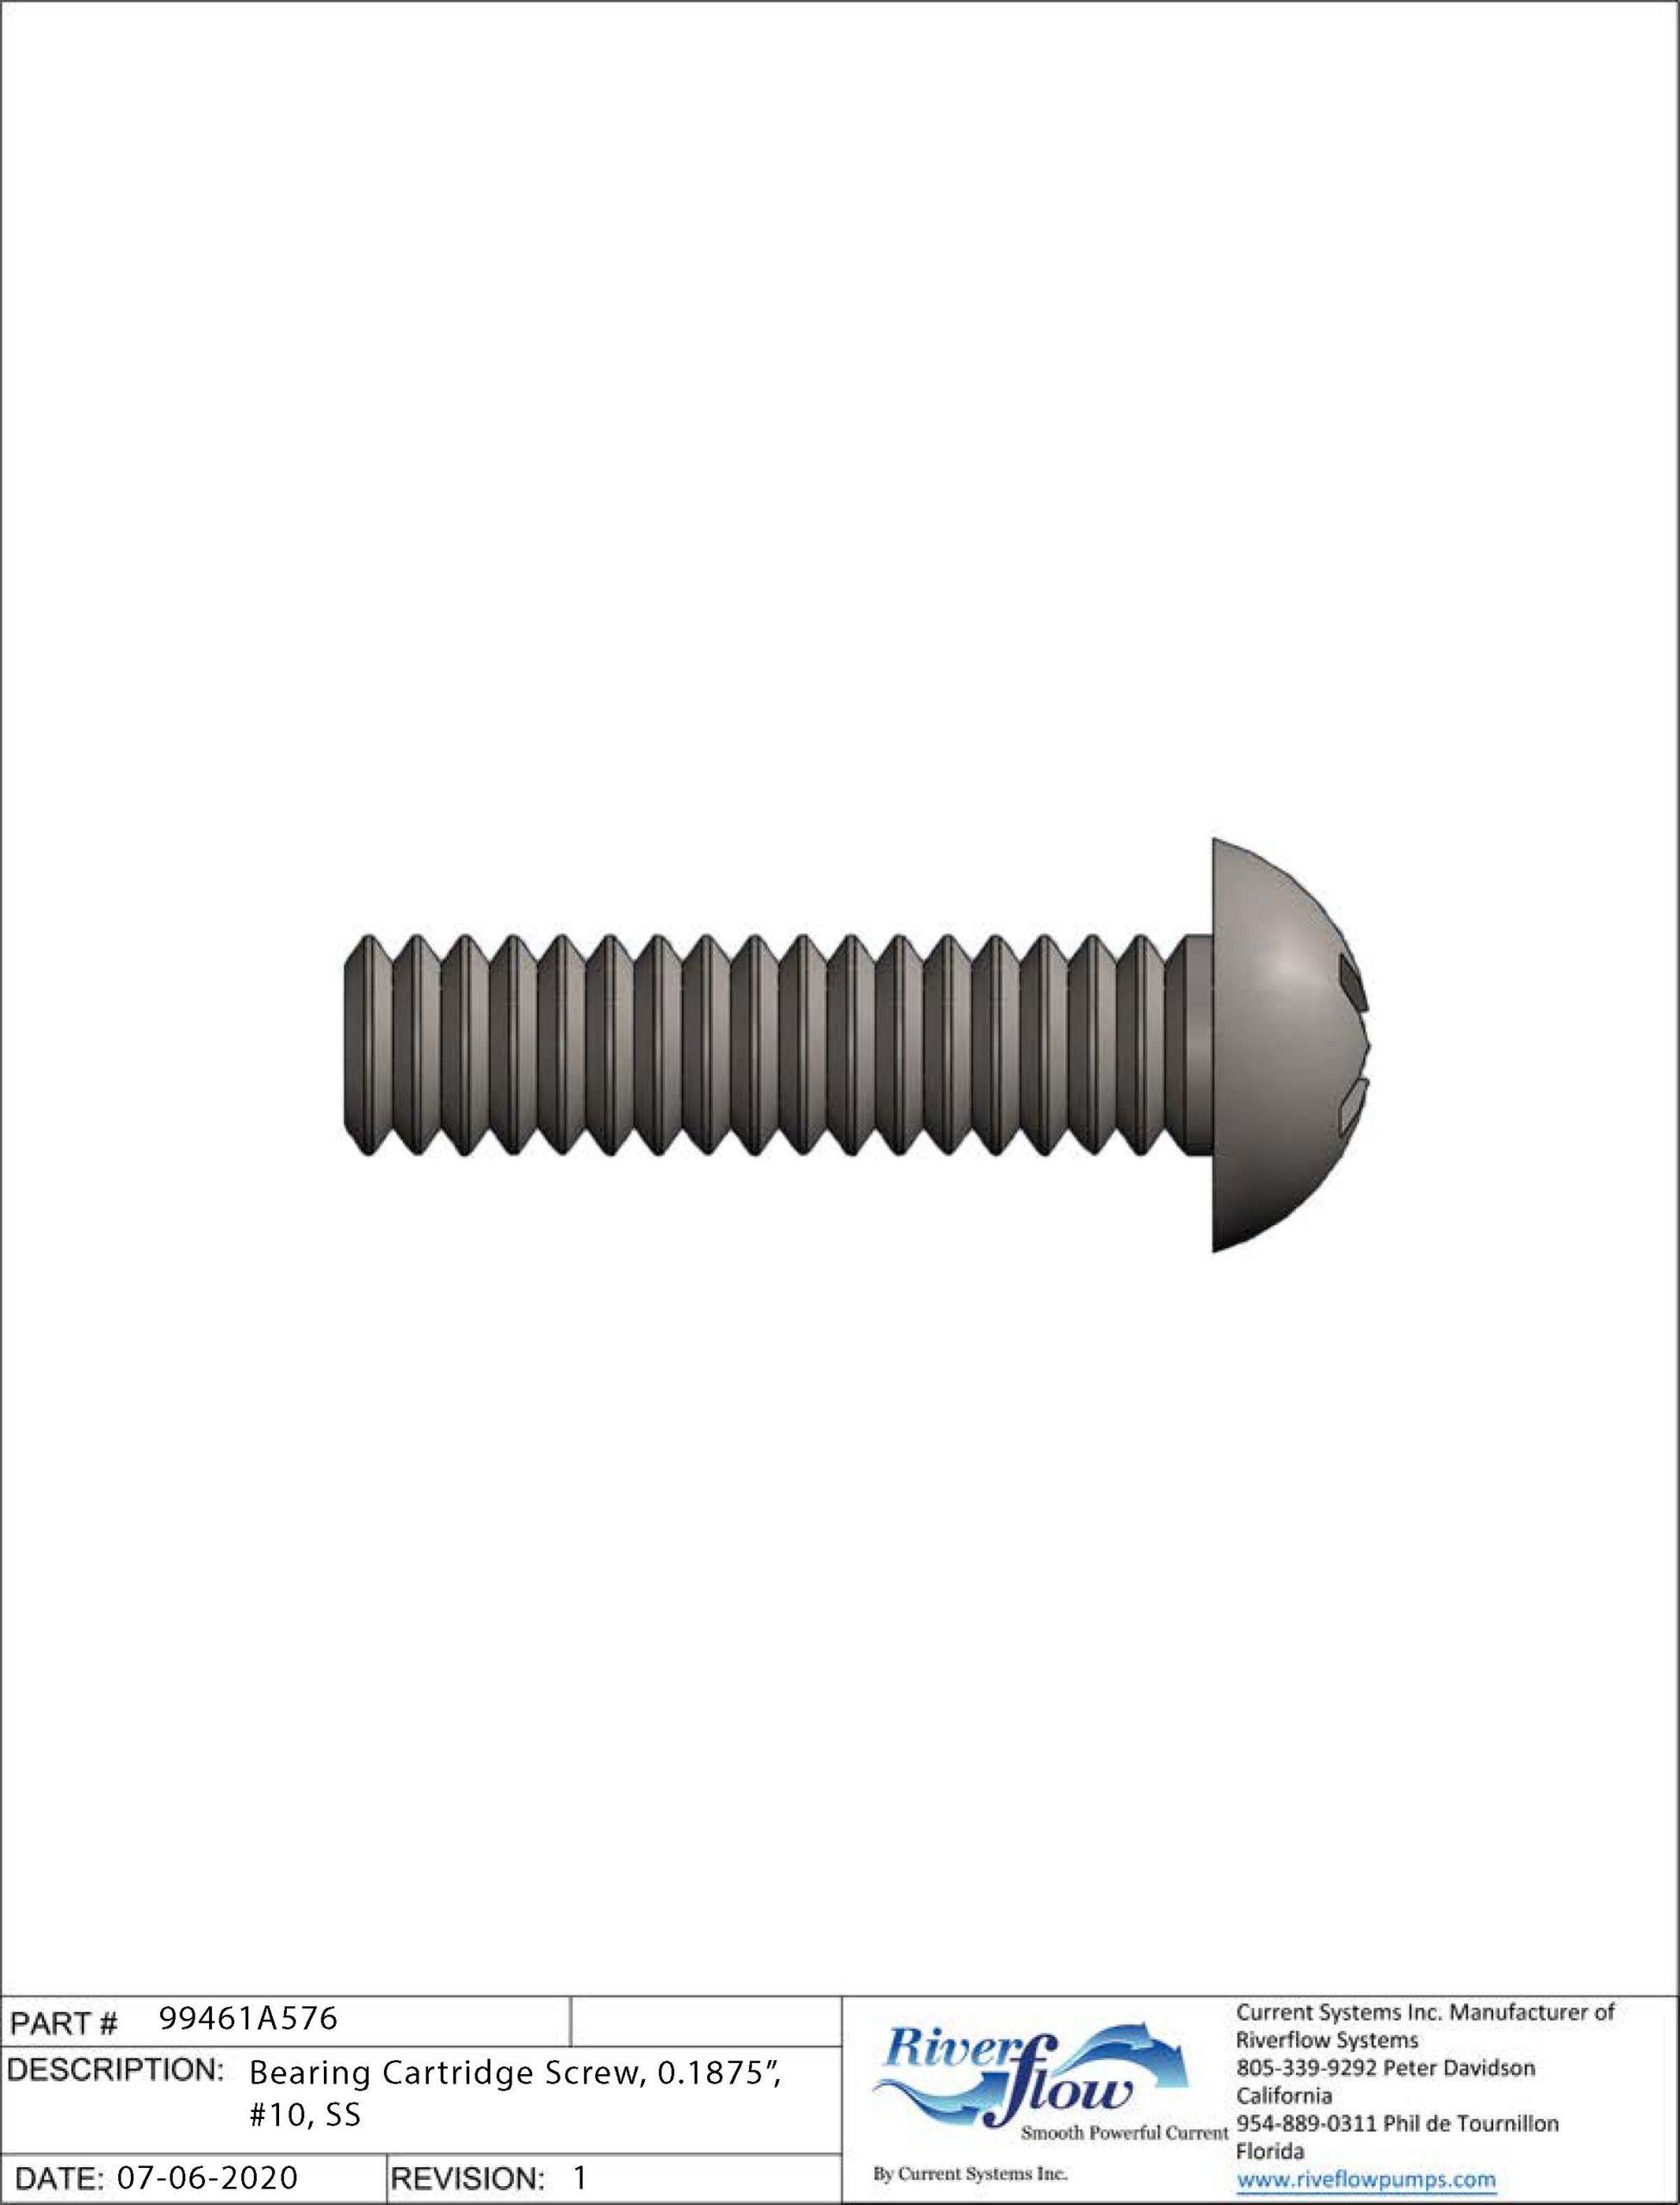 PN#: 99461A576  Bearing Cartridge Screw, 0.1875